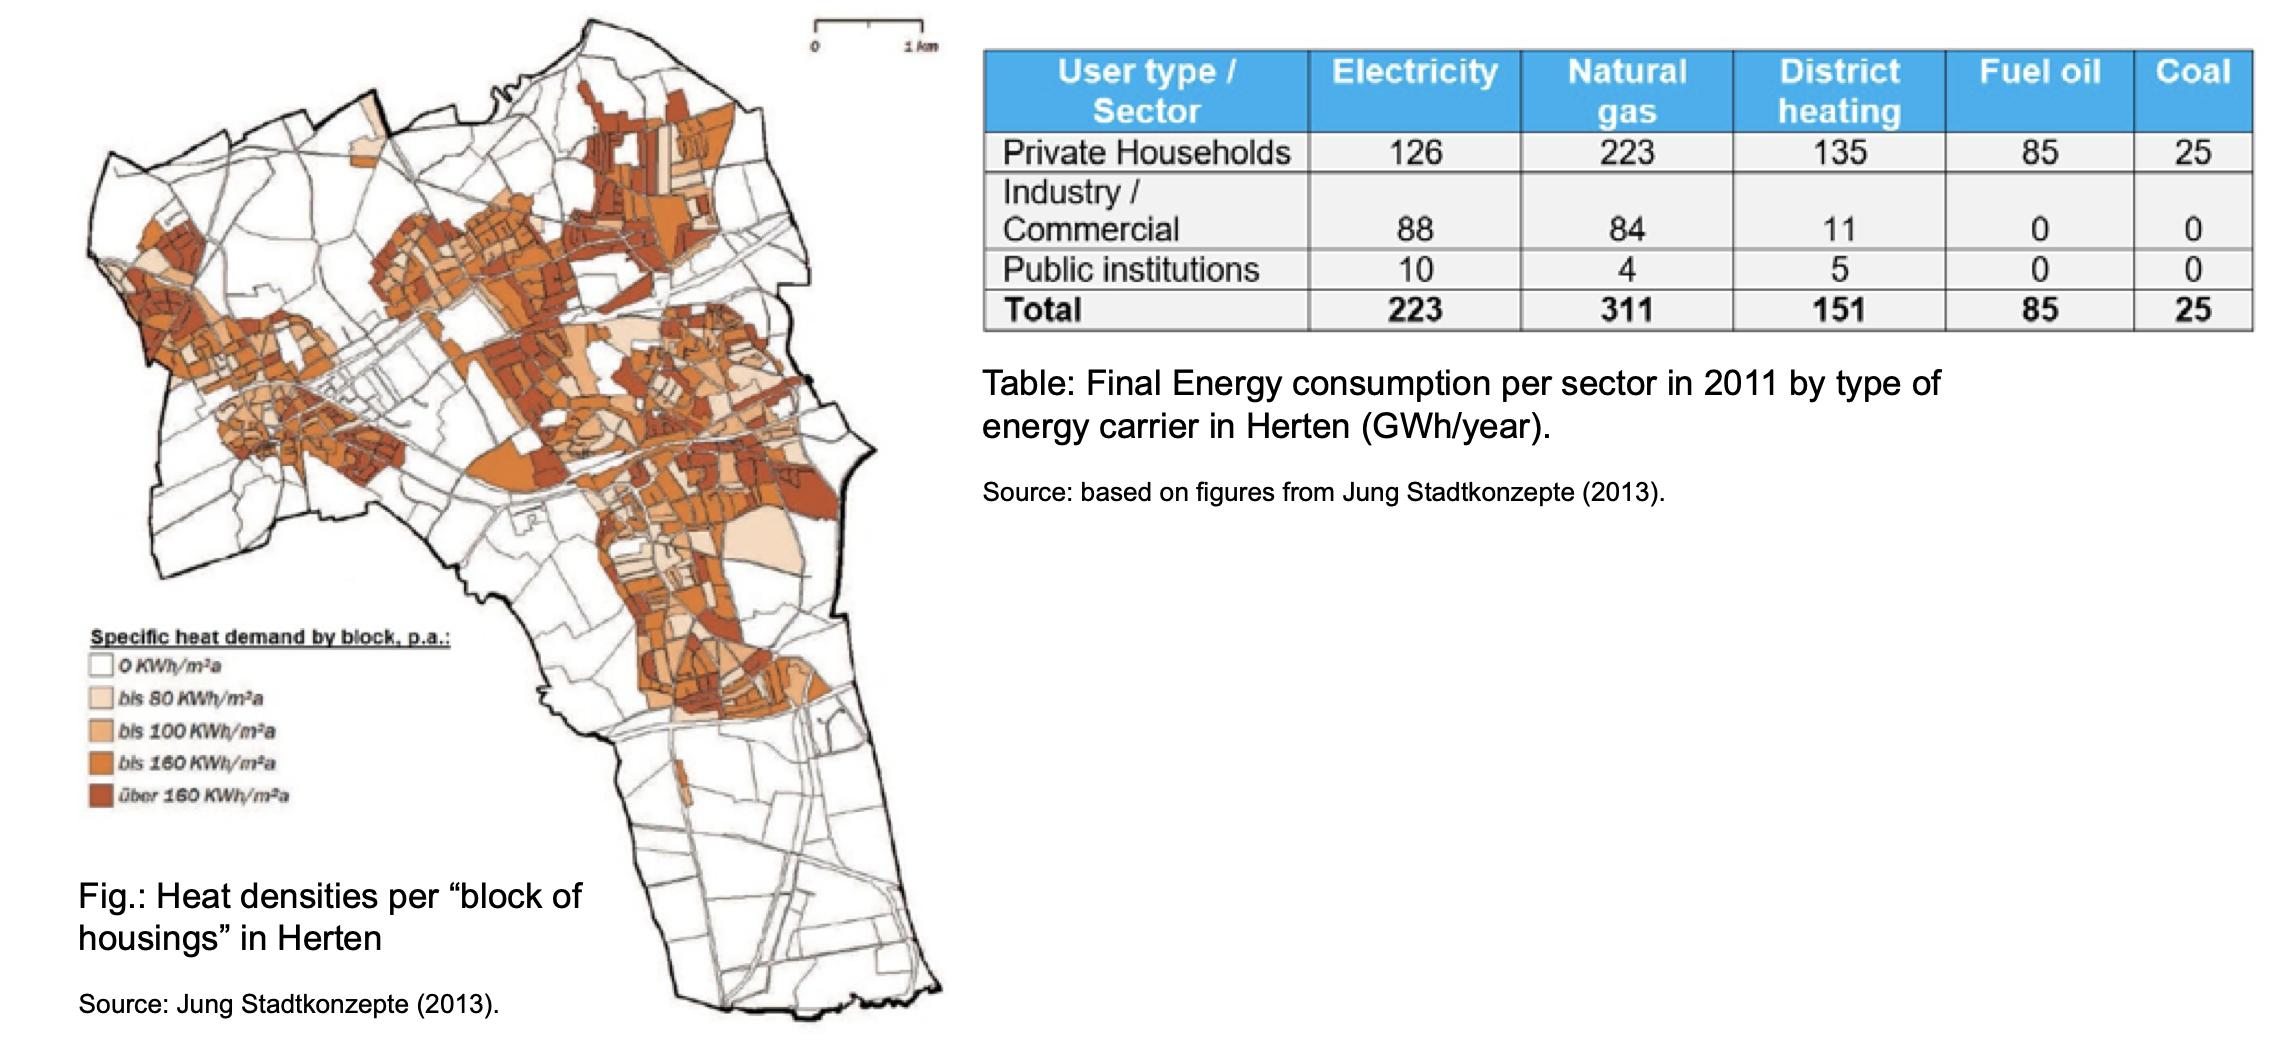 Heat density and final energy consumption per sector in Herten